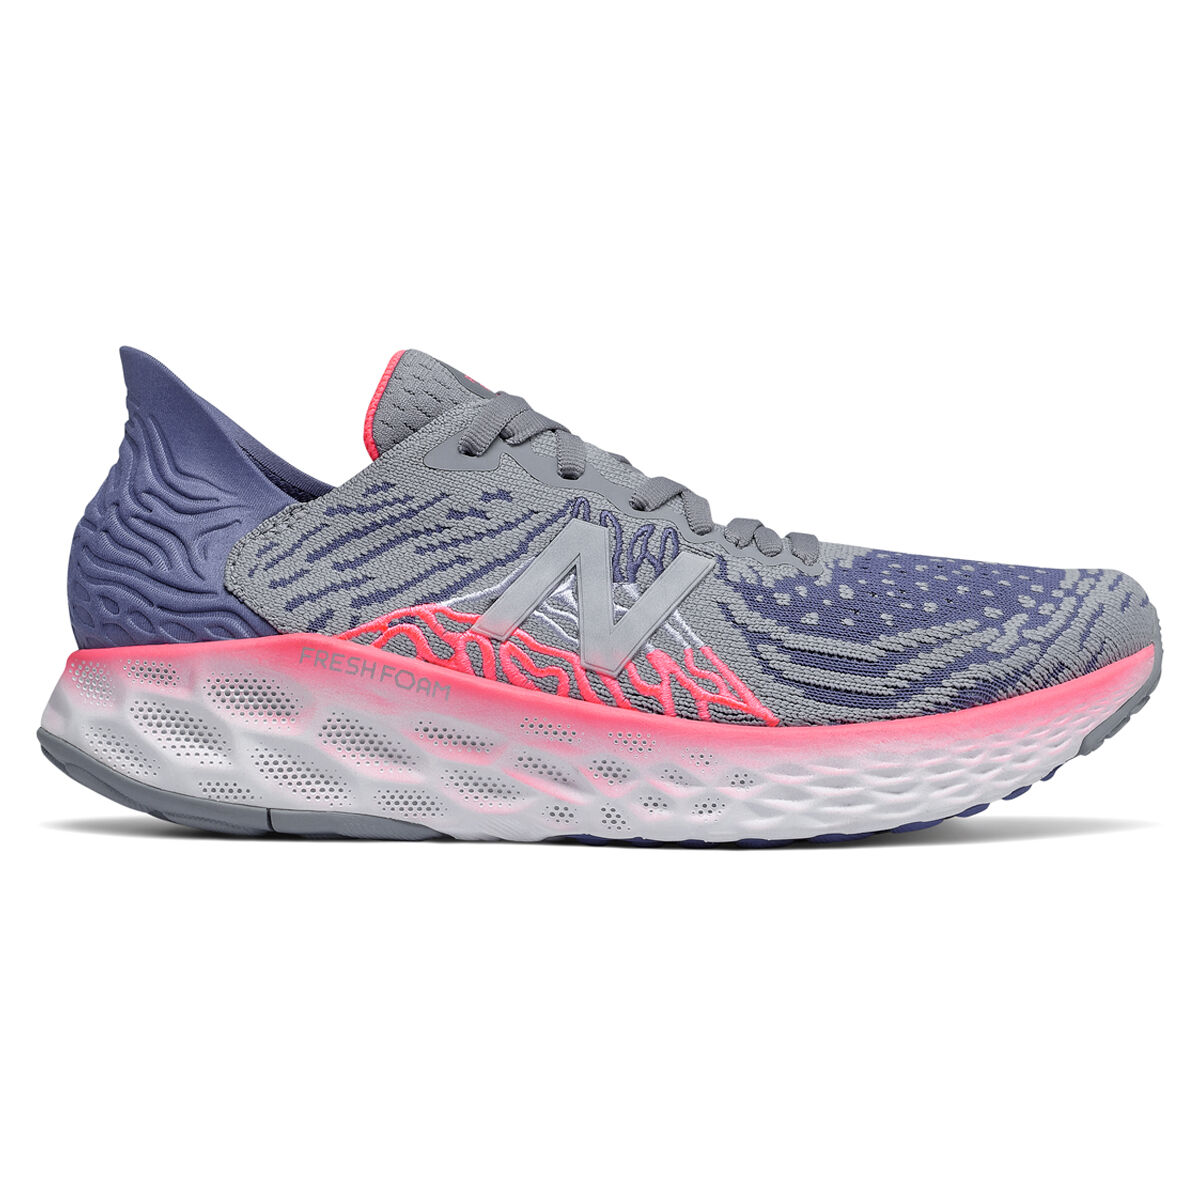 New Balance 1080 v10 Womens Running